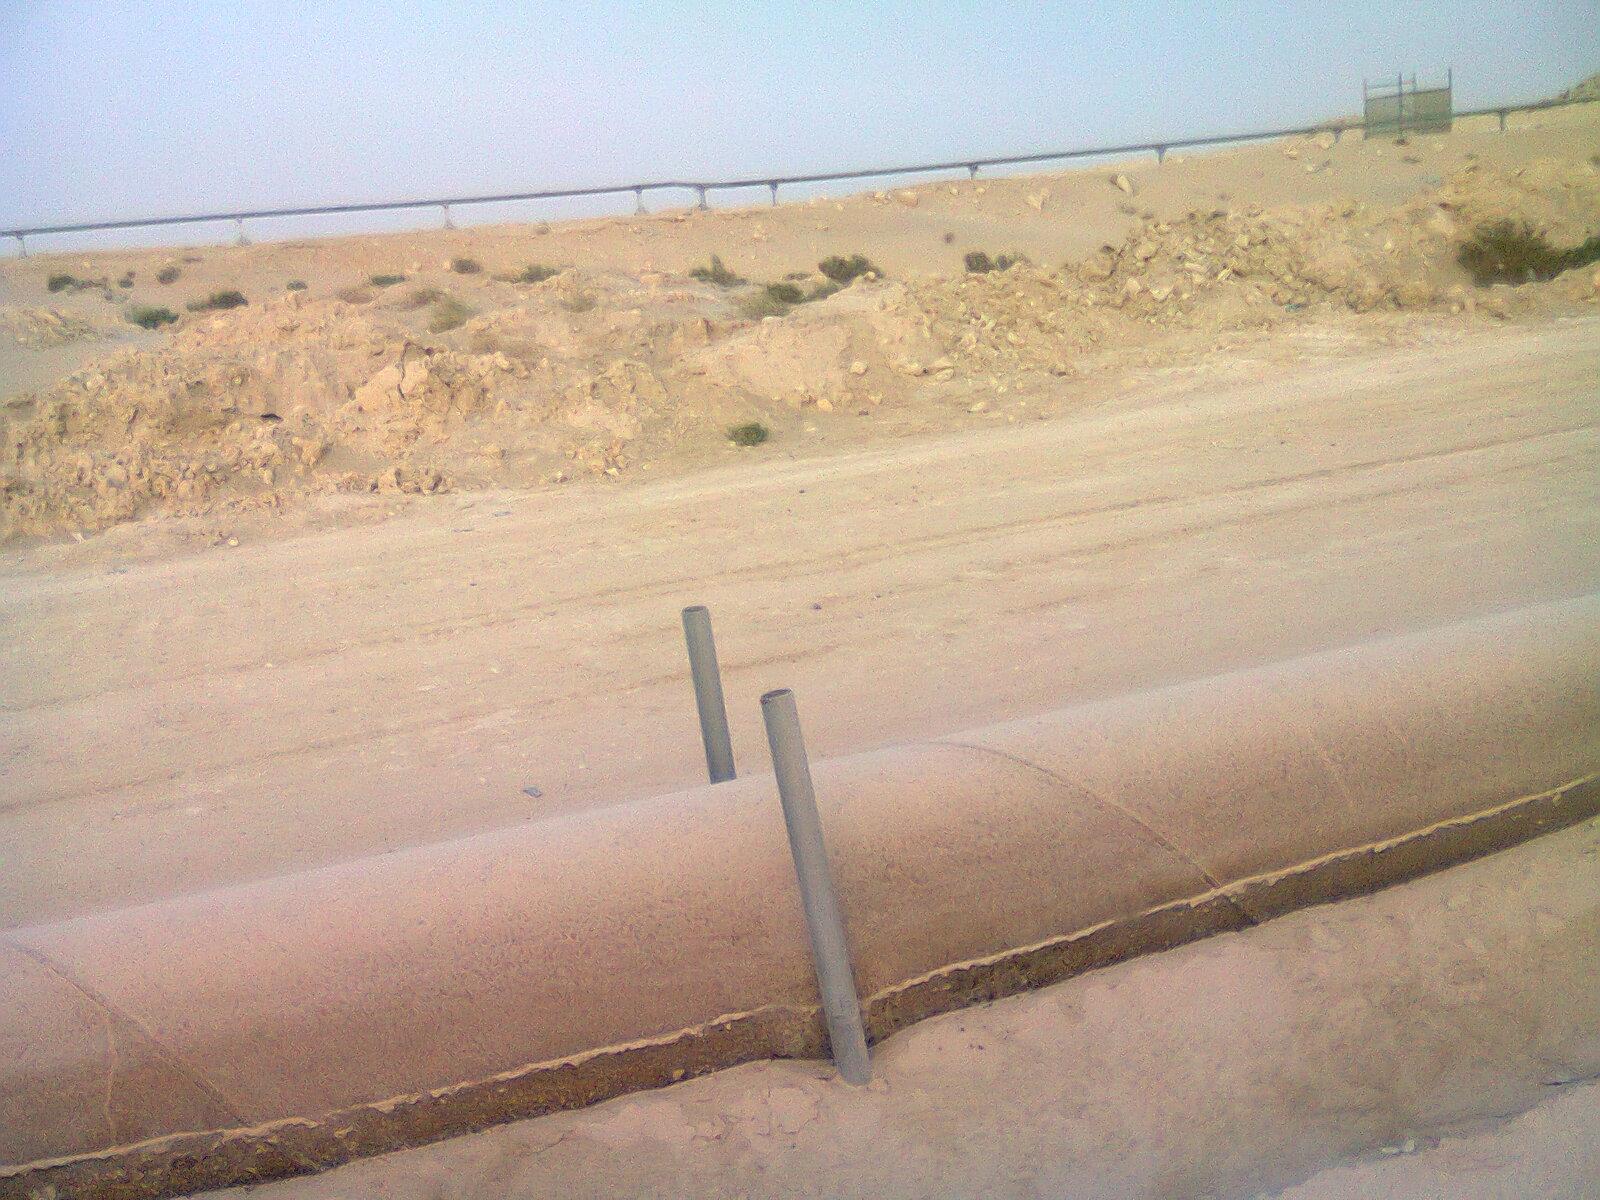 arabie saoudite benefice geant petrole aramco - L'Energeek